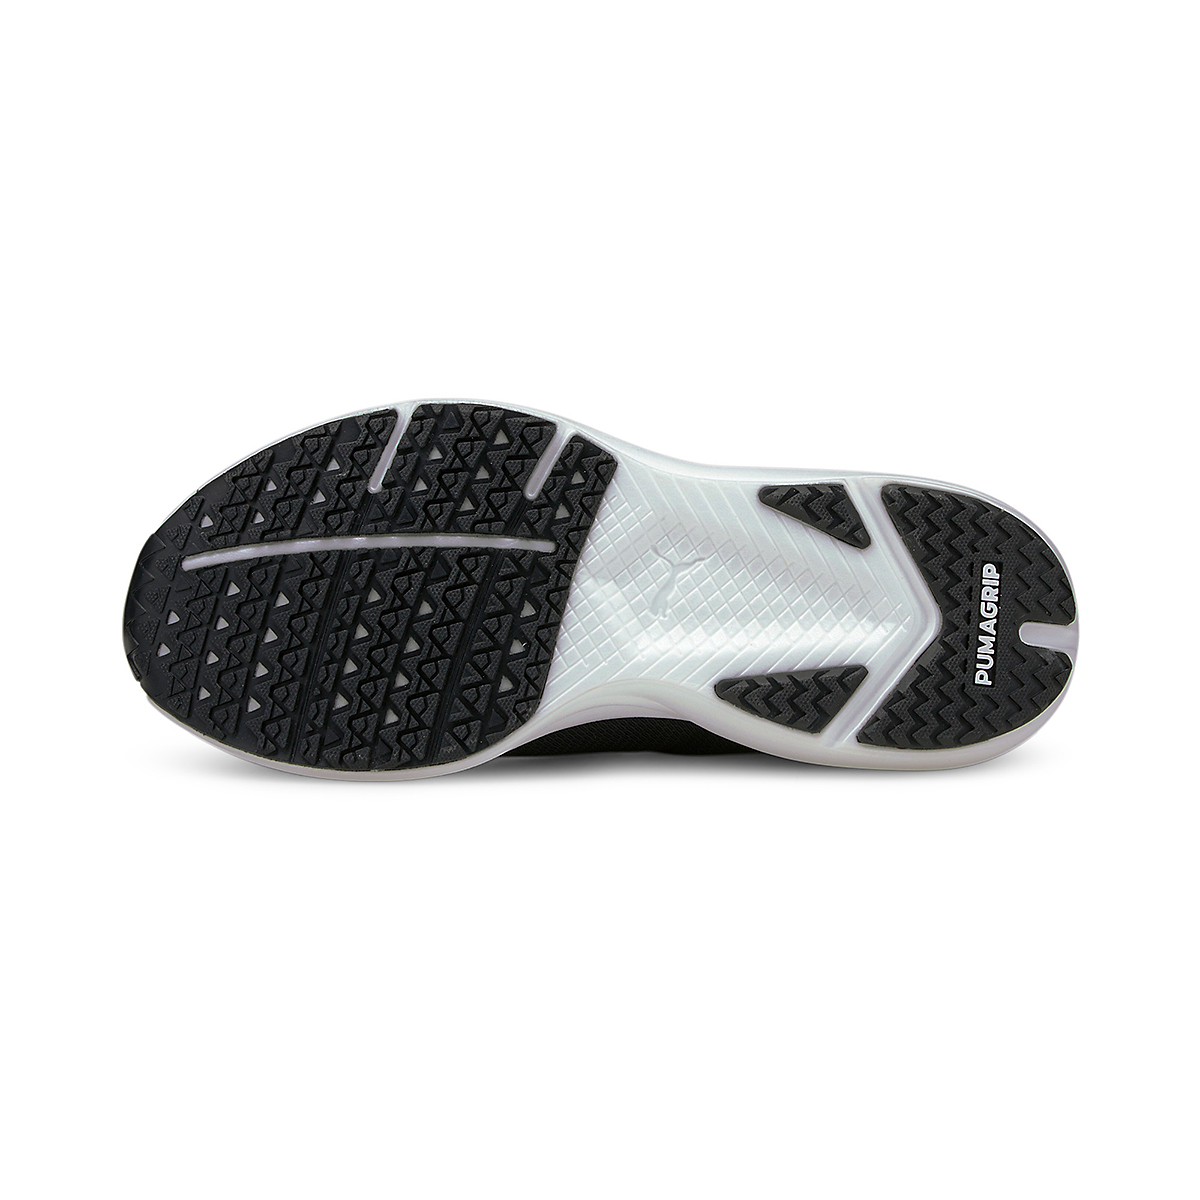 Women's Puma Liberate Nitro Running Shoe - Color: Puma Black - Size: 5.5 - Width: Regular, Puma Black, large, image 3